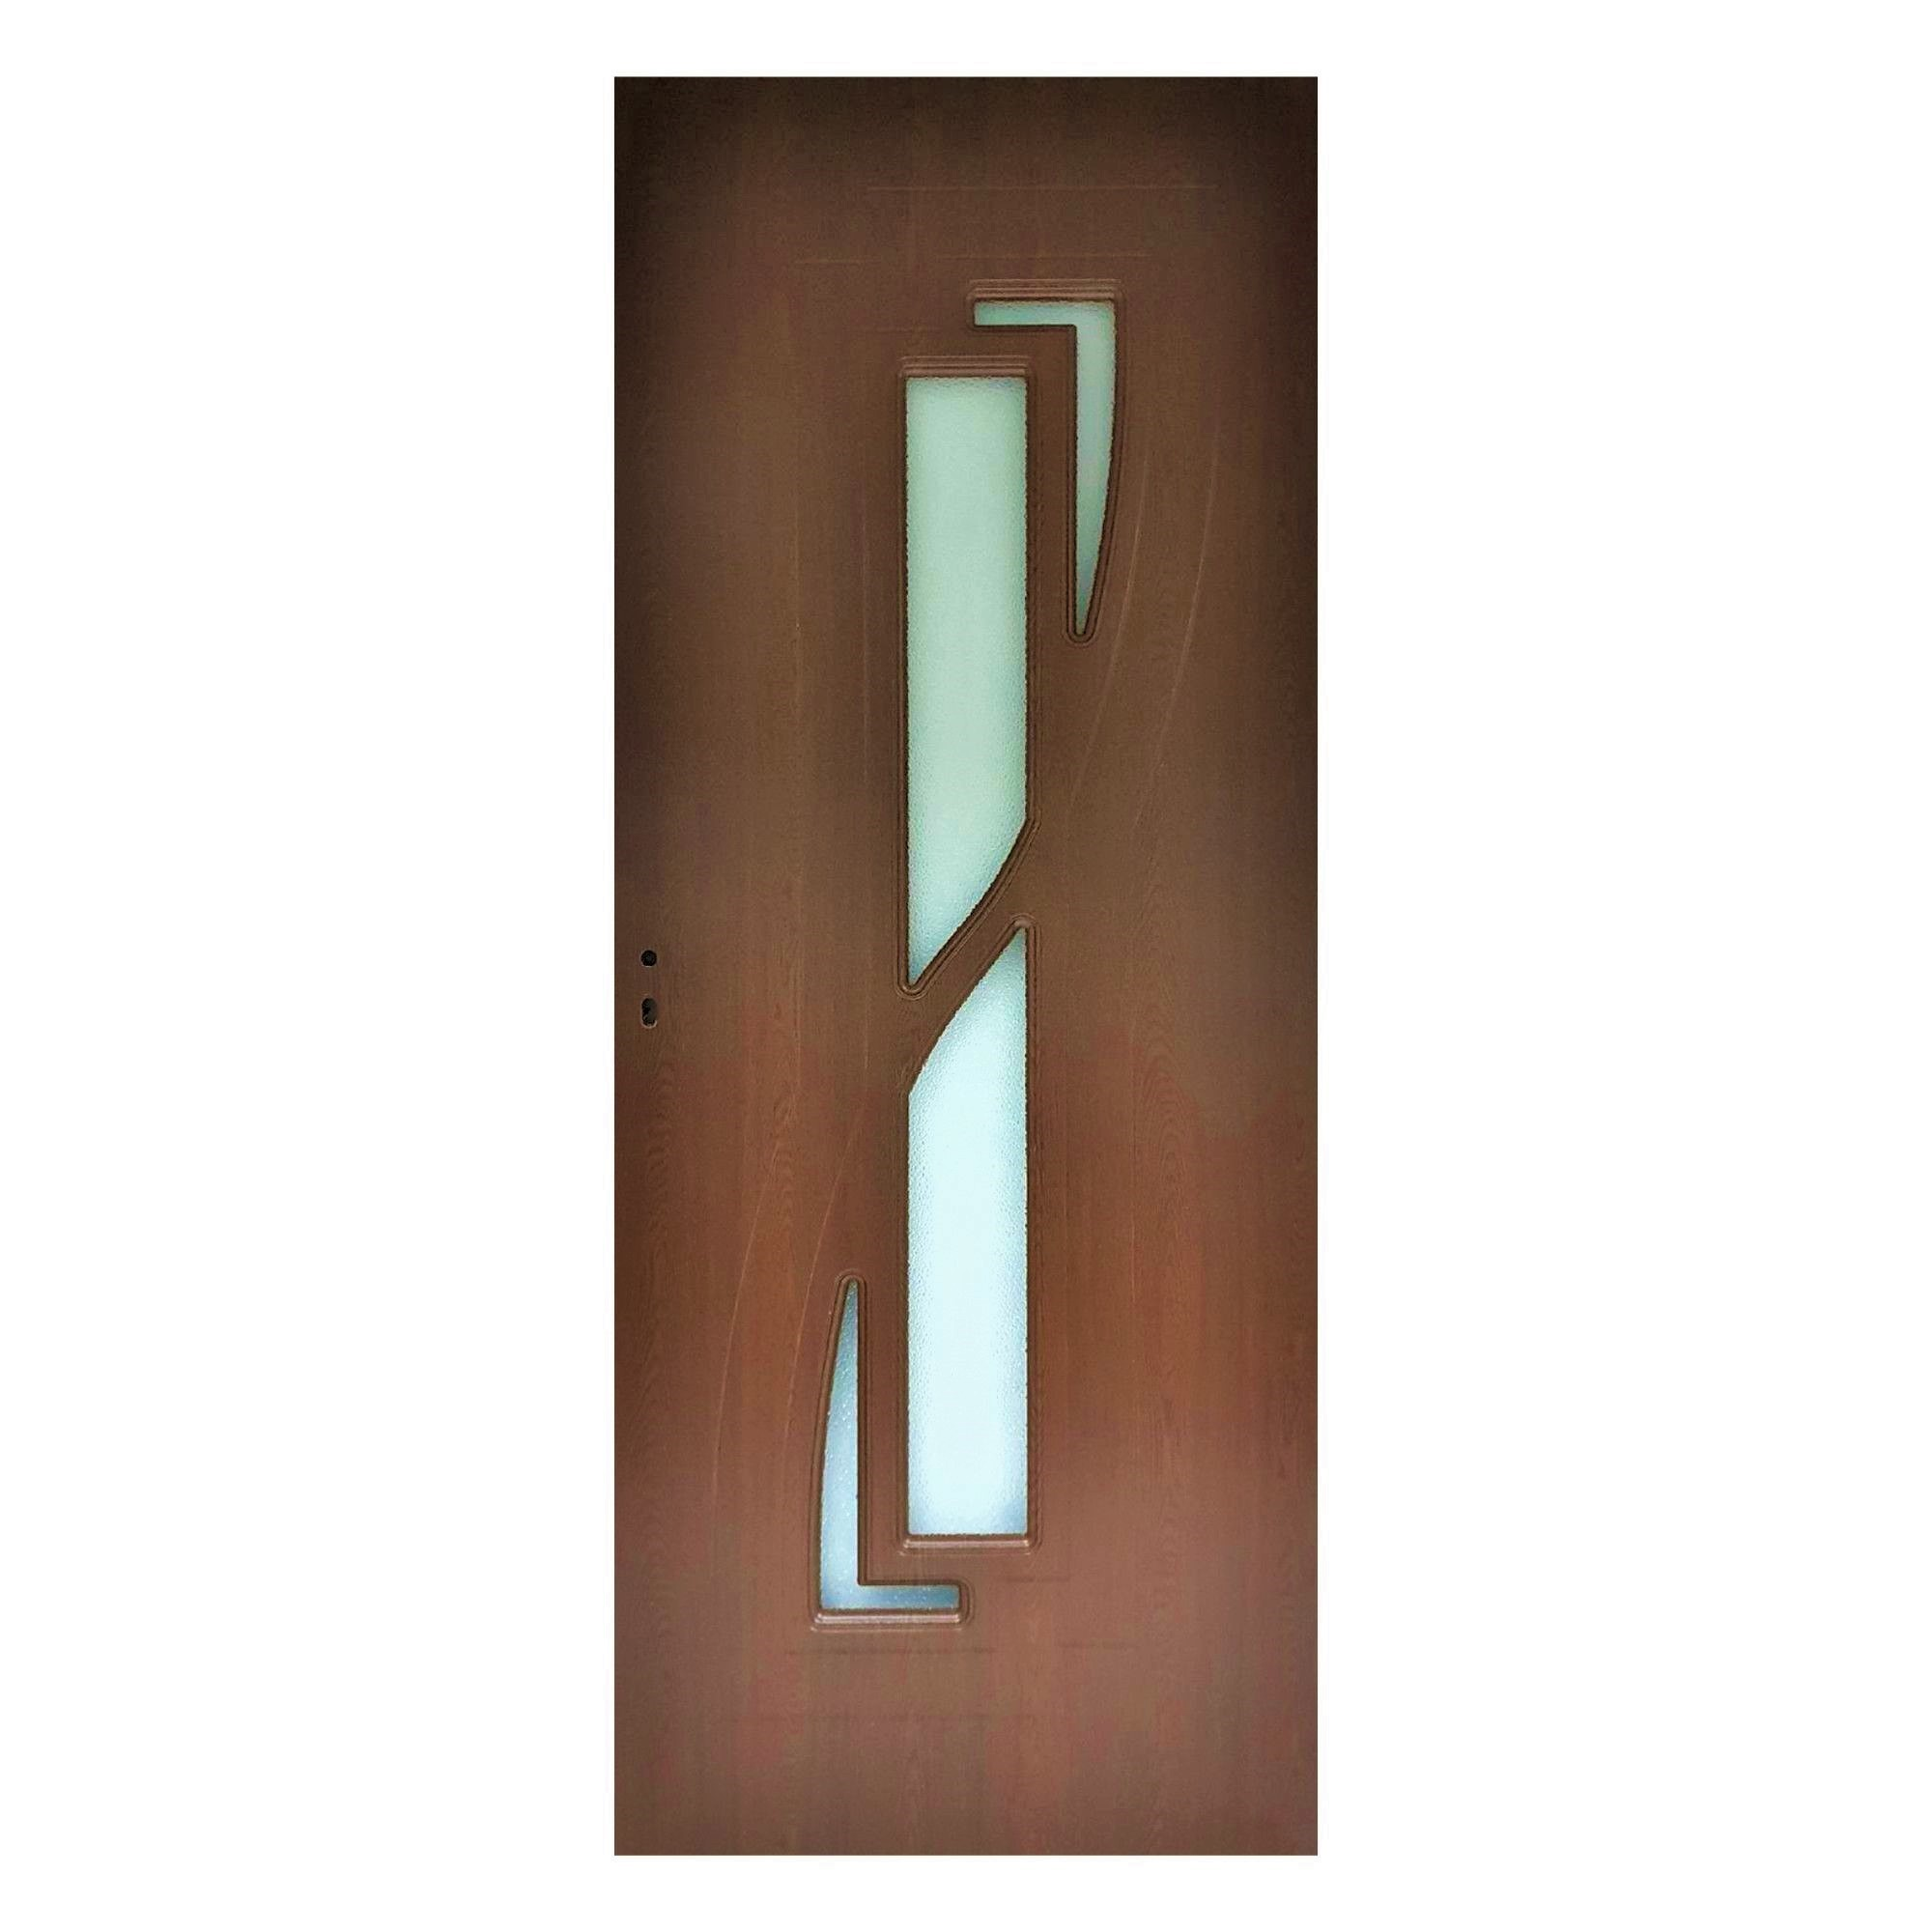 Usa interior cu geam Pamate M042, stejar auriu, 203 x 80 x 3,5 cm + toc reglabil, reversibila imagine 2021 mathaus